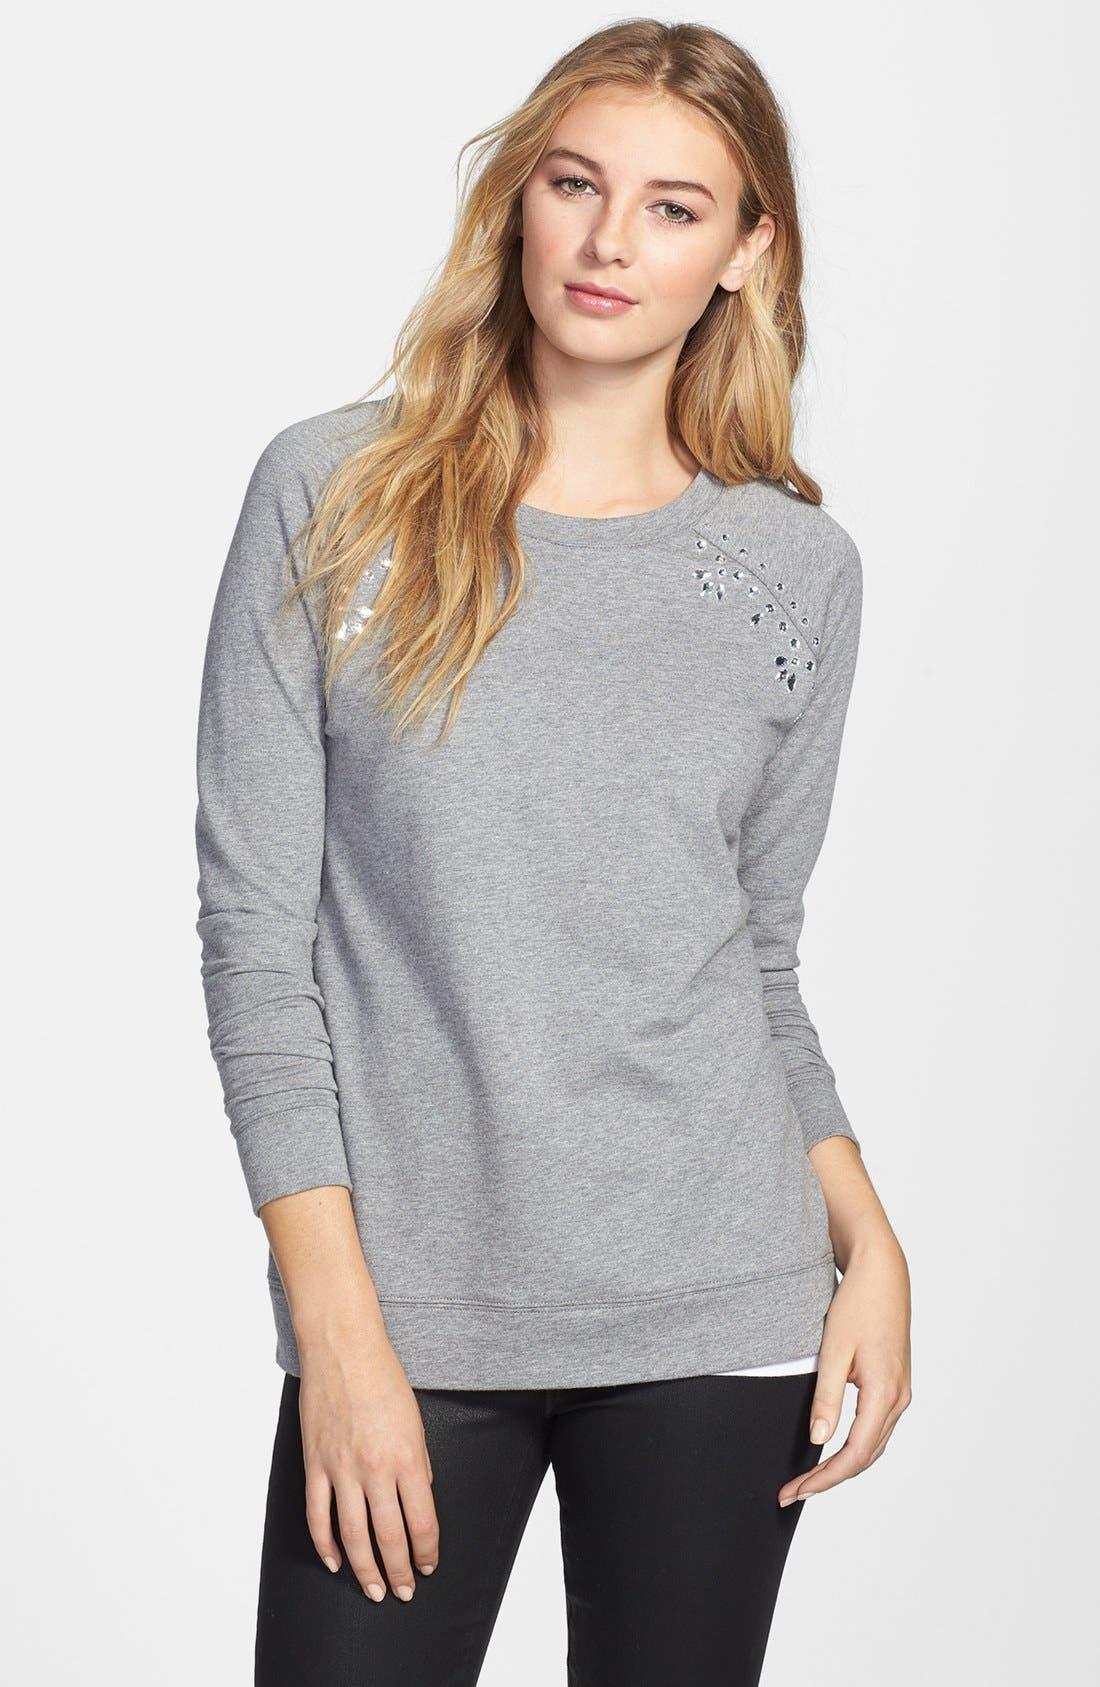 Alternate Image 1 Selected - Two by Vince Camuto Embellished Raglan Sleeve Cotton Blend Sweatshirt